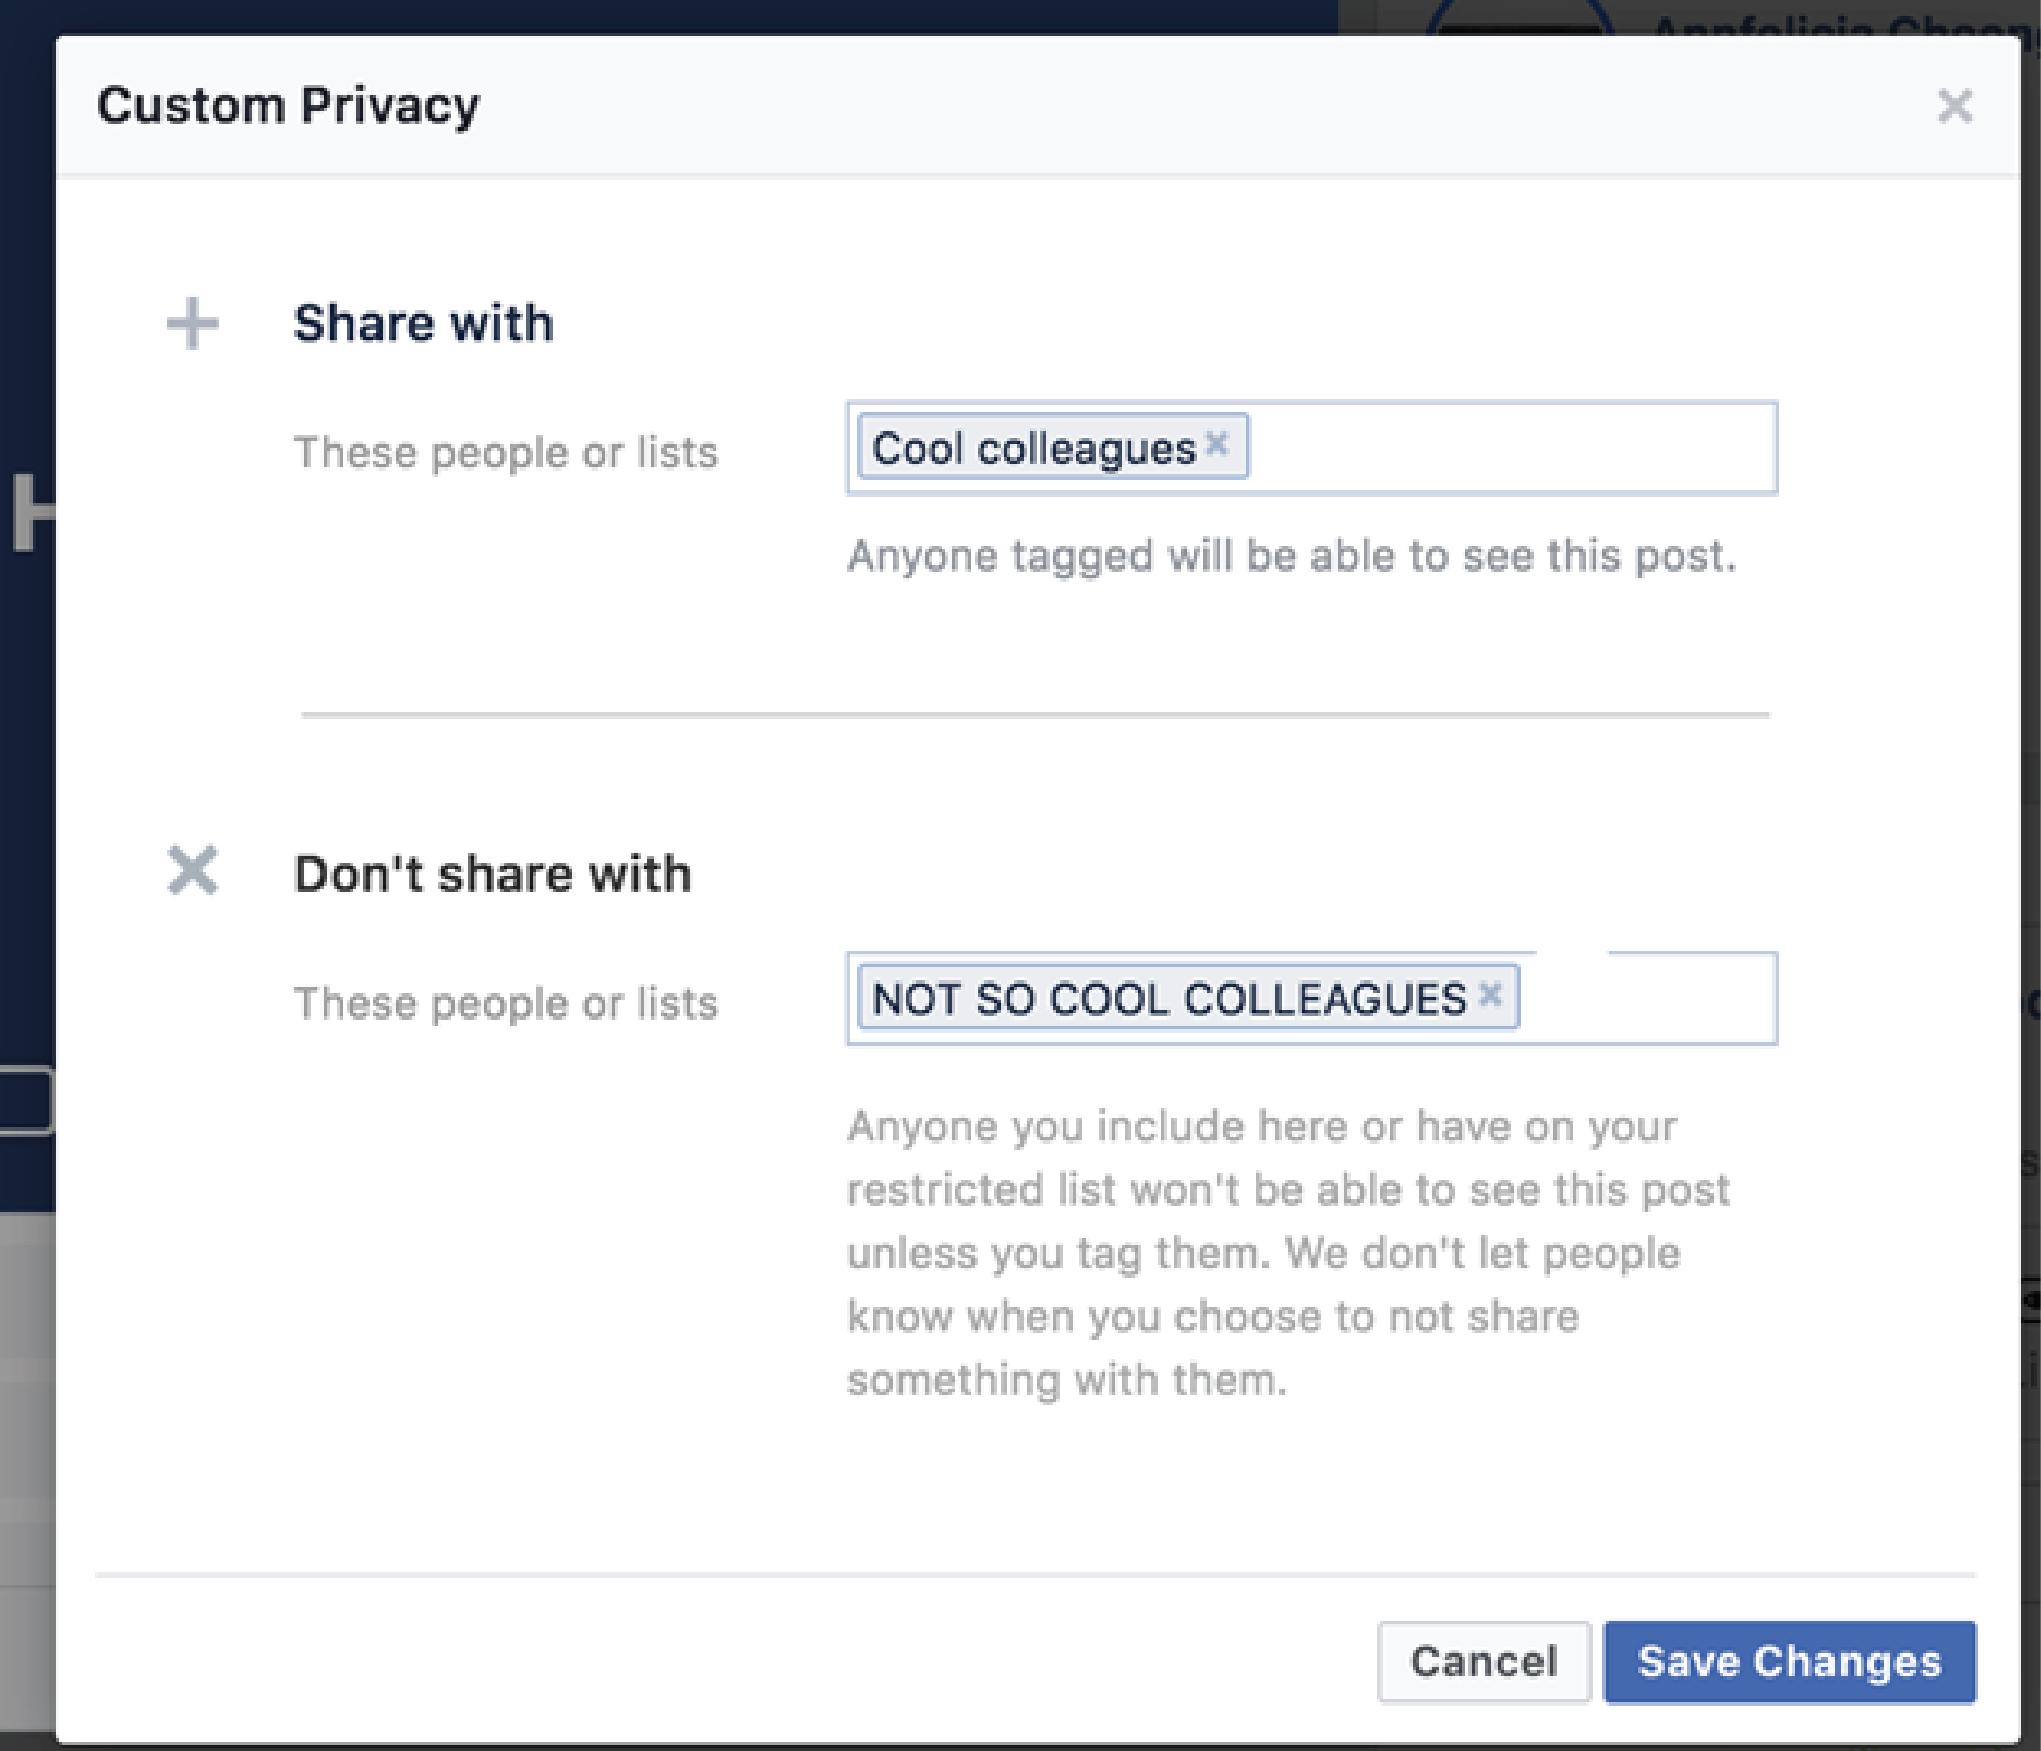 Custom list - Share and Don't Share